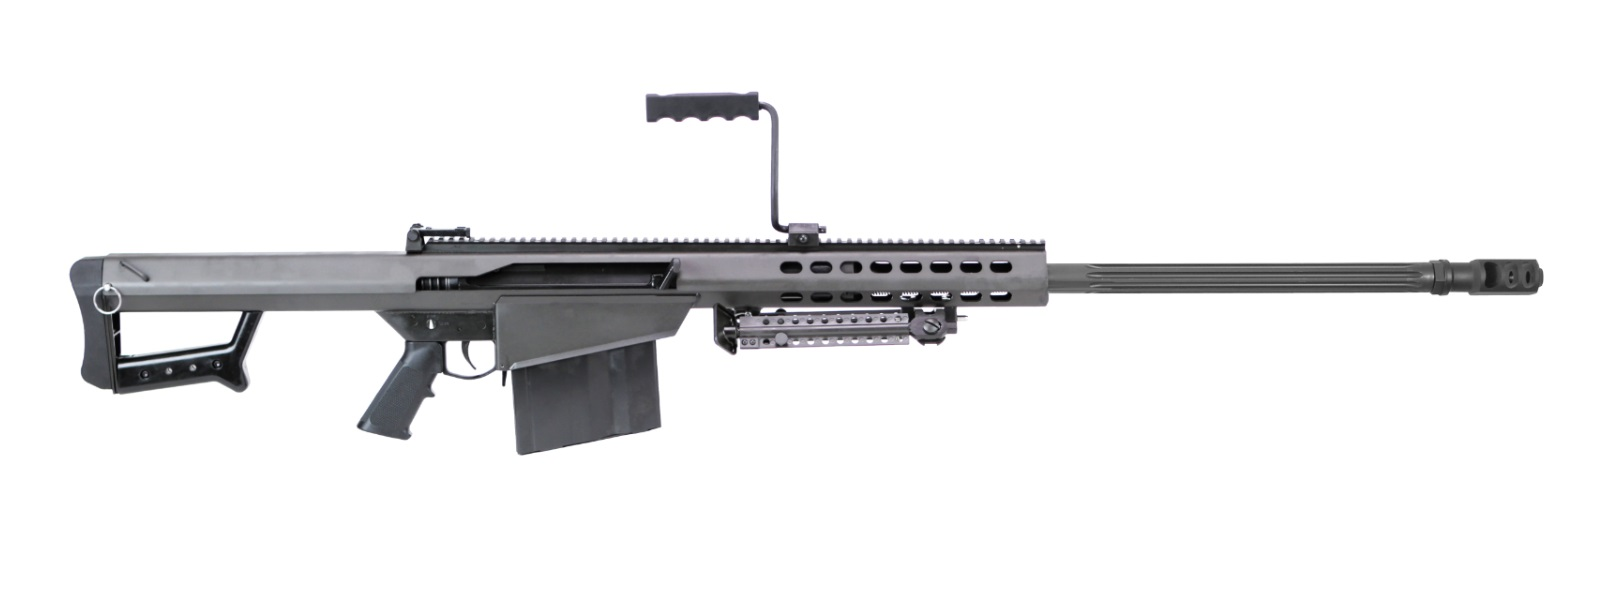 Barrett Firearms MODEL 82A1 416 BARRETT